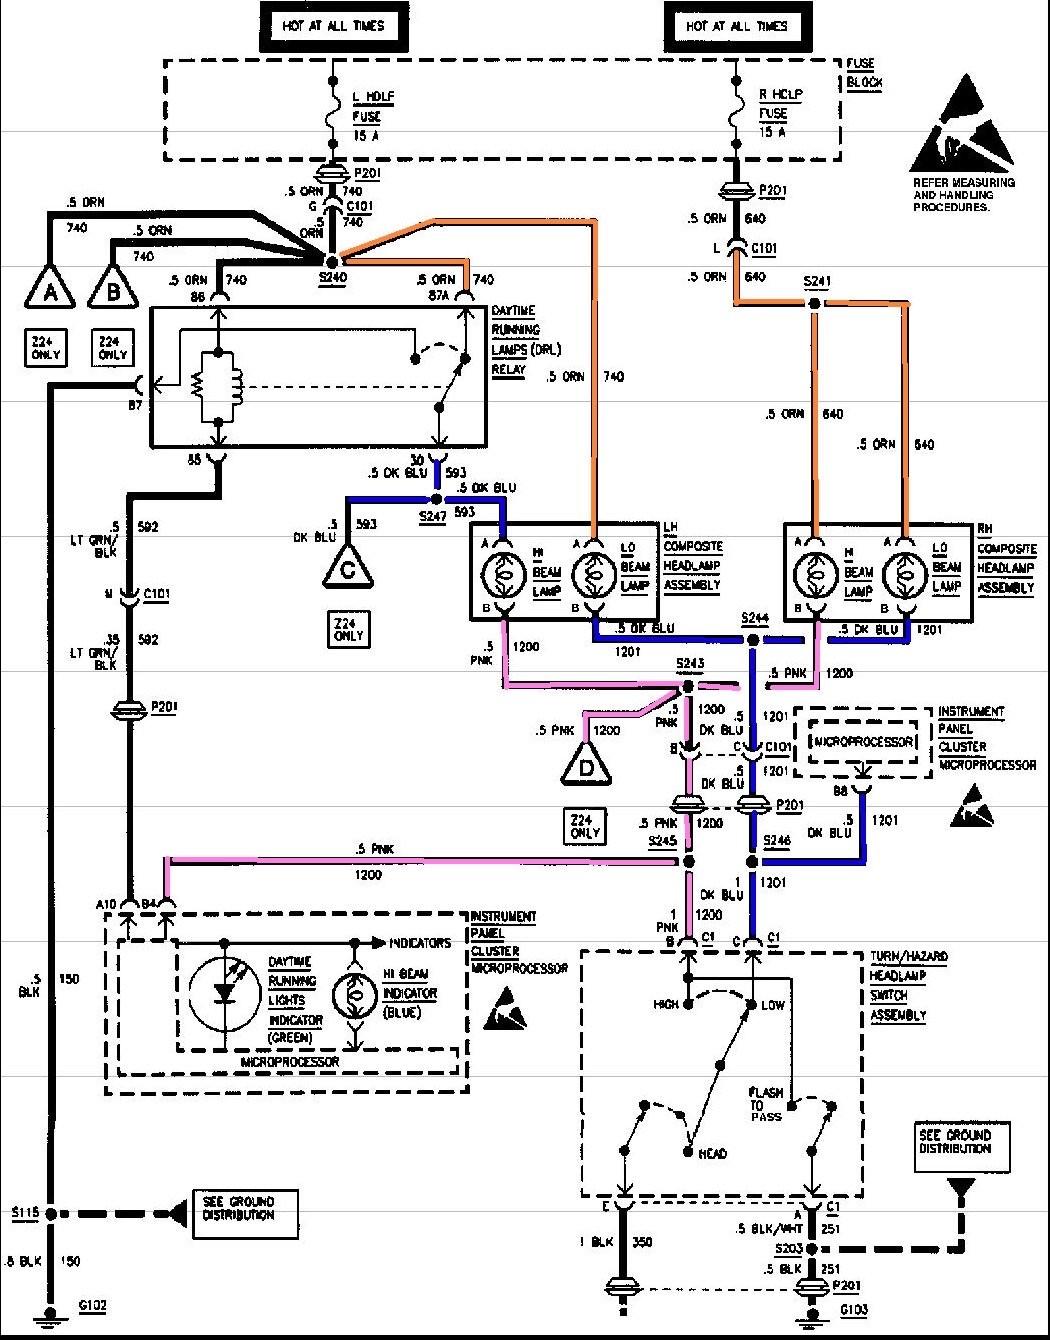 2003 Chevy Cavalier Headlight Wiring Diagram Hampton Ceiling Fan Wiring Diagram For Wiring Diagram Schematics